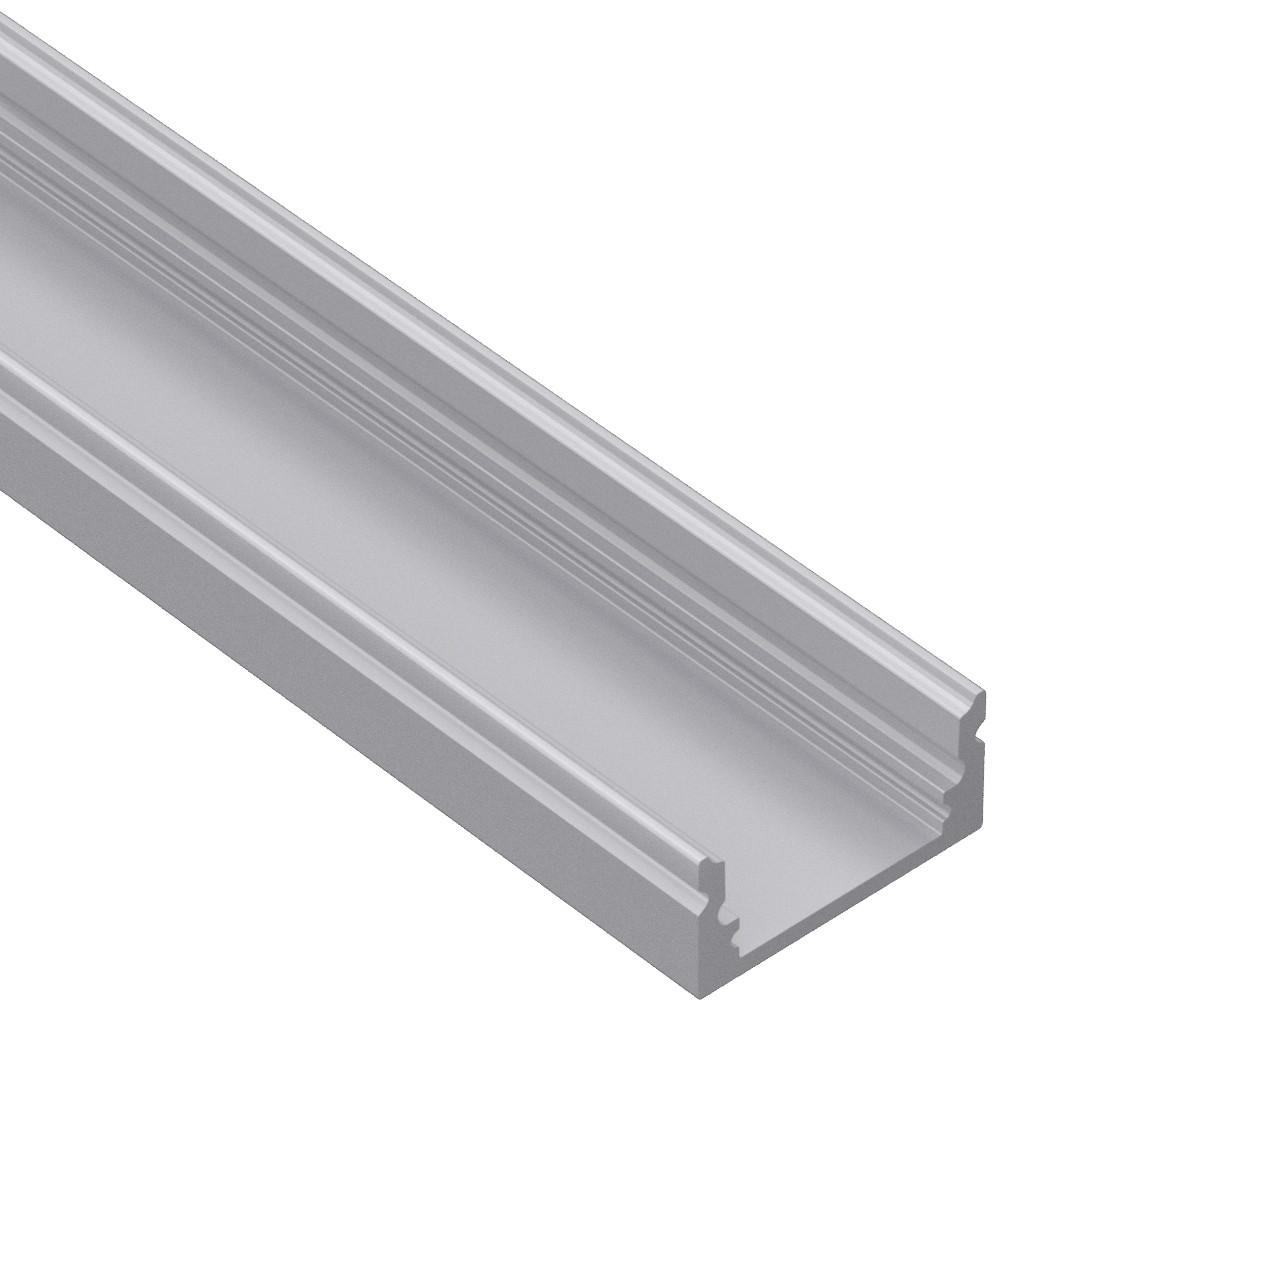 AL60 60˚ Lensed/Optic LED Profile for LED Strip 13.5x17mm